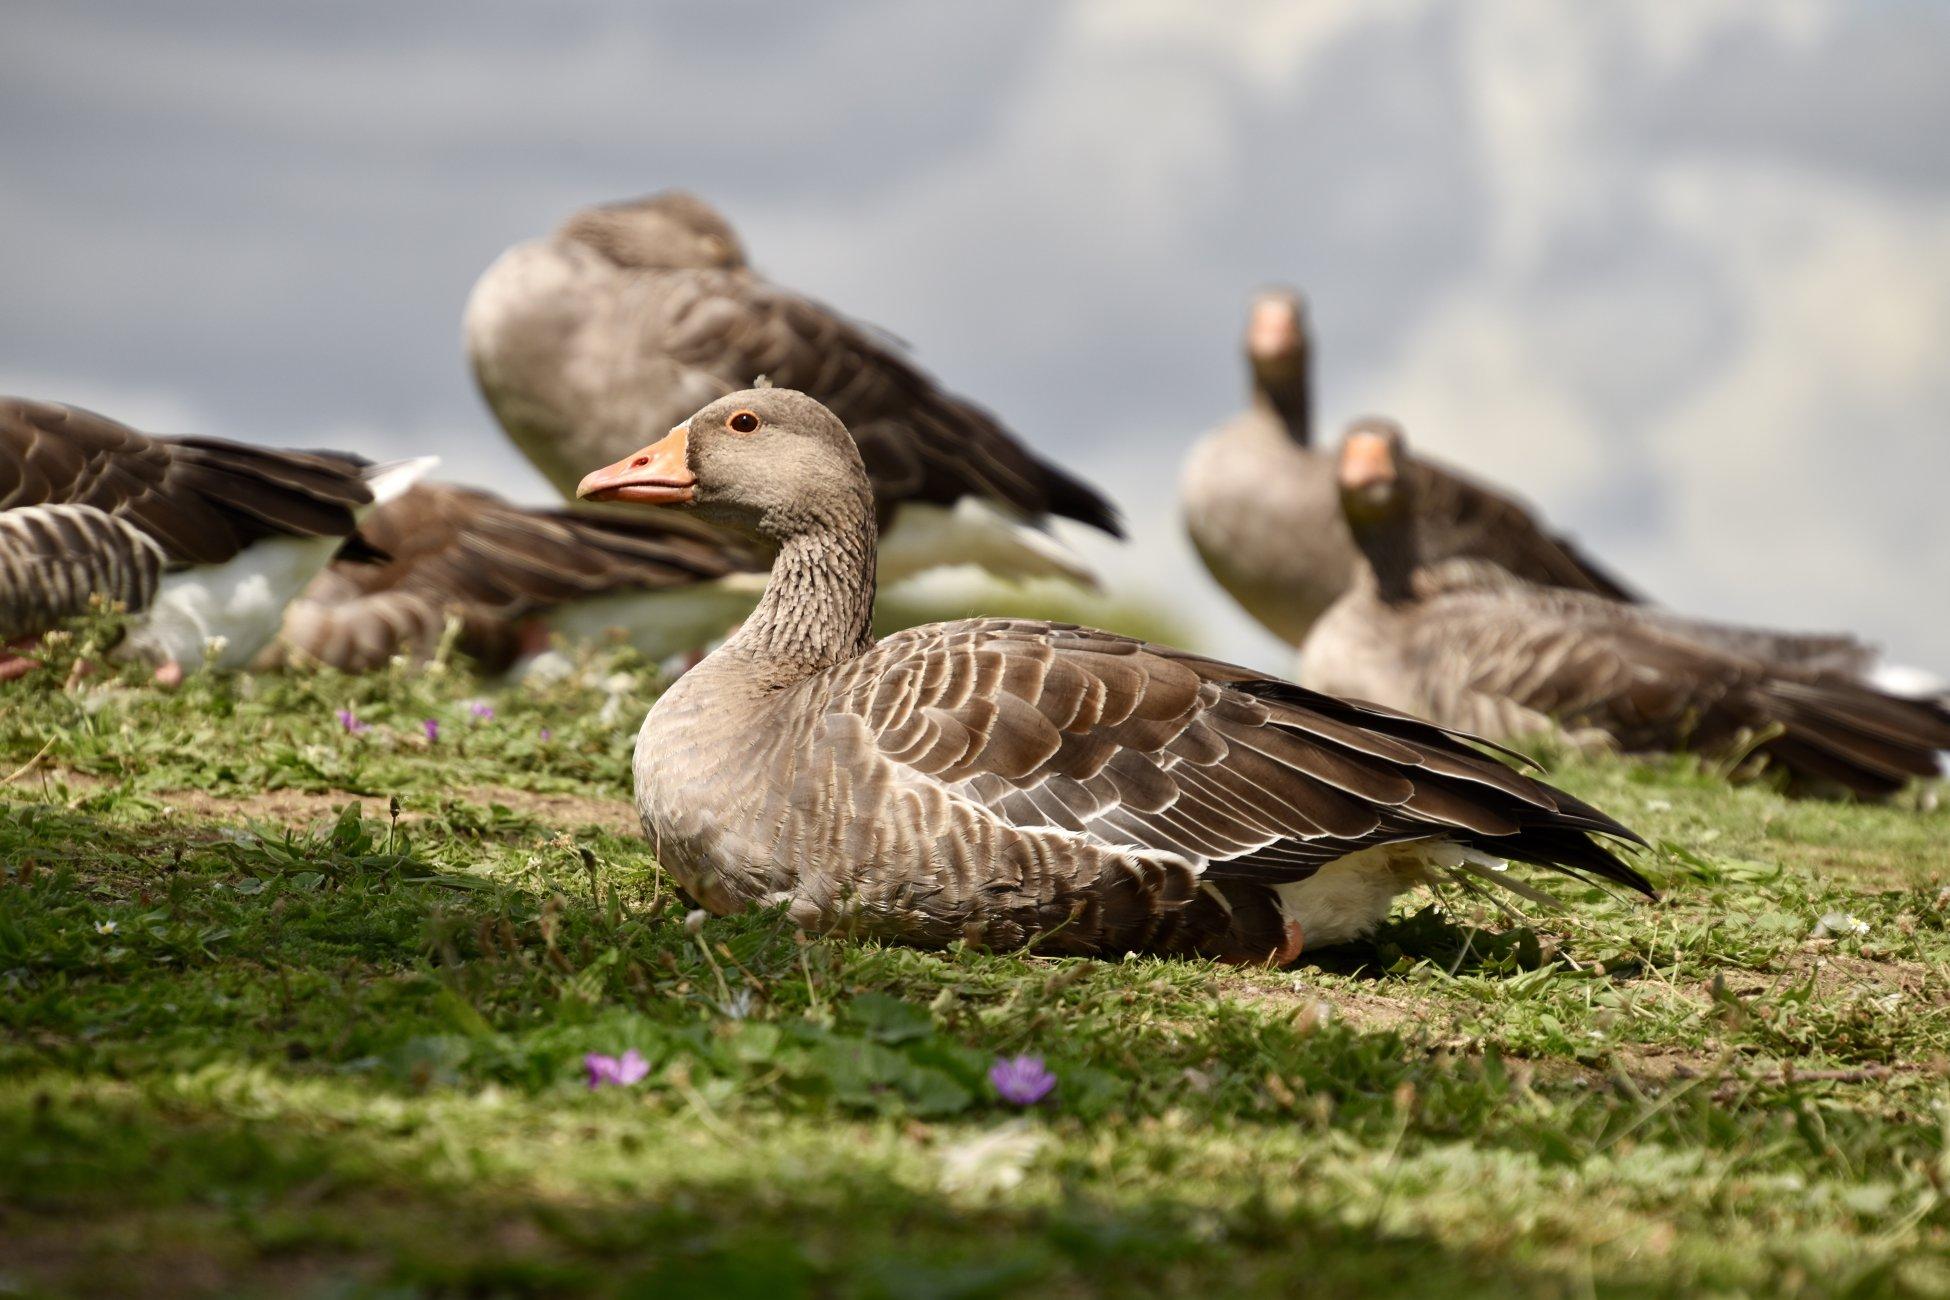 Goose got an eye on you